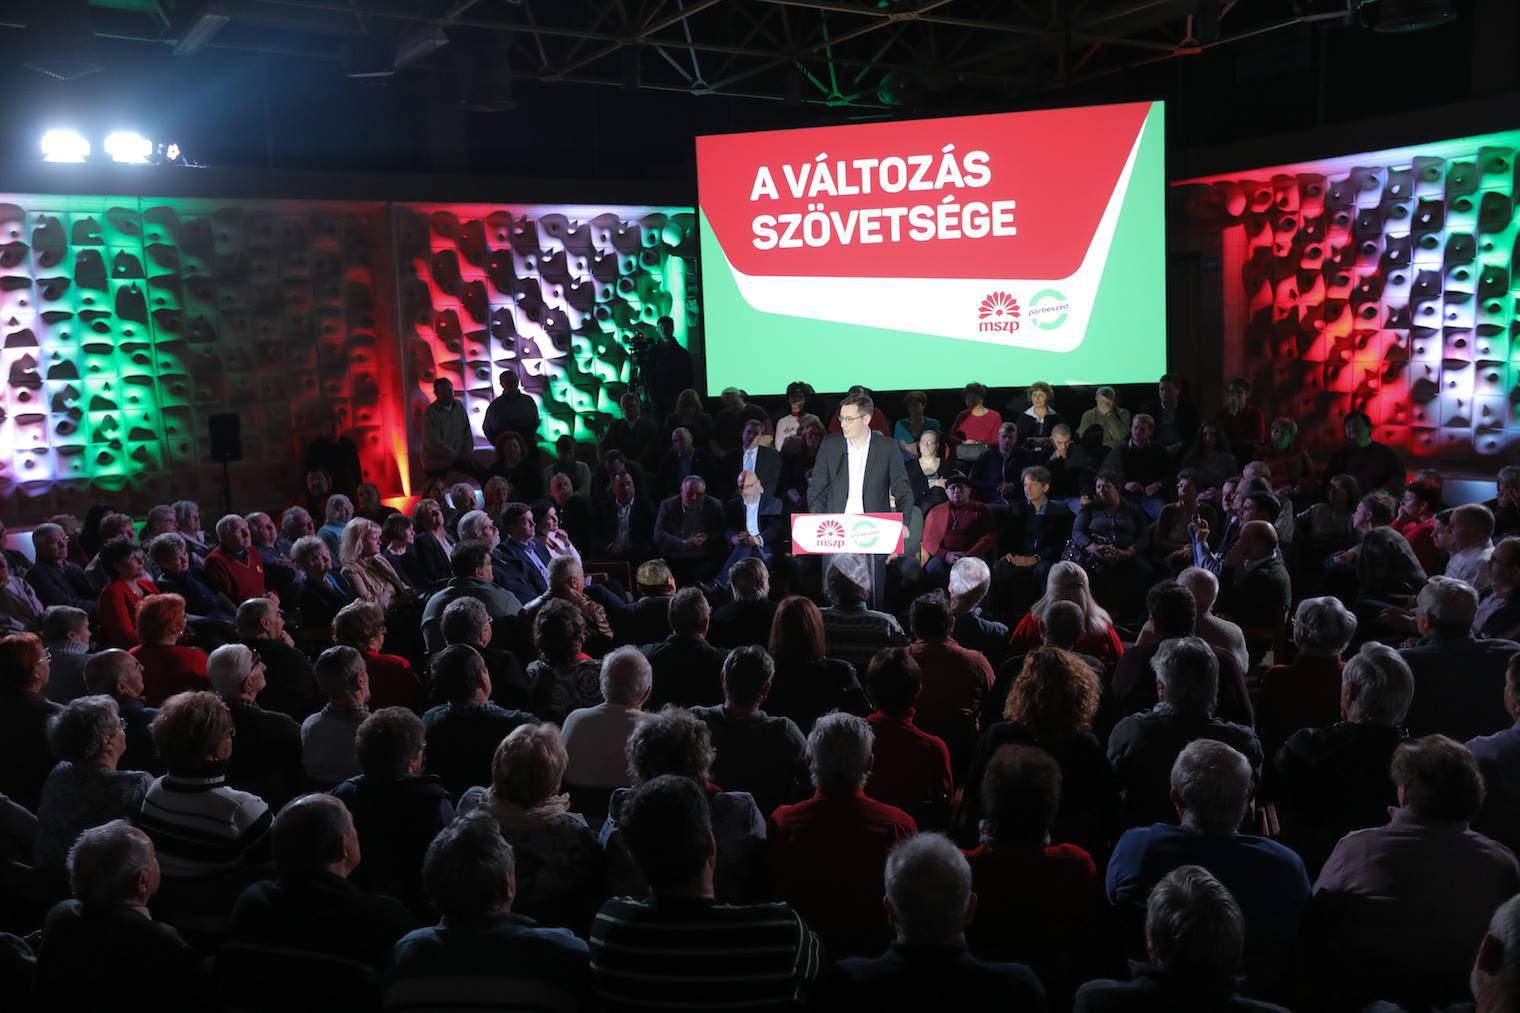 PM candidate Karácsony socialists